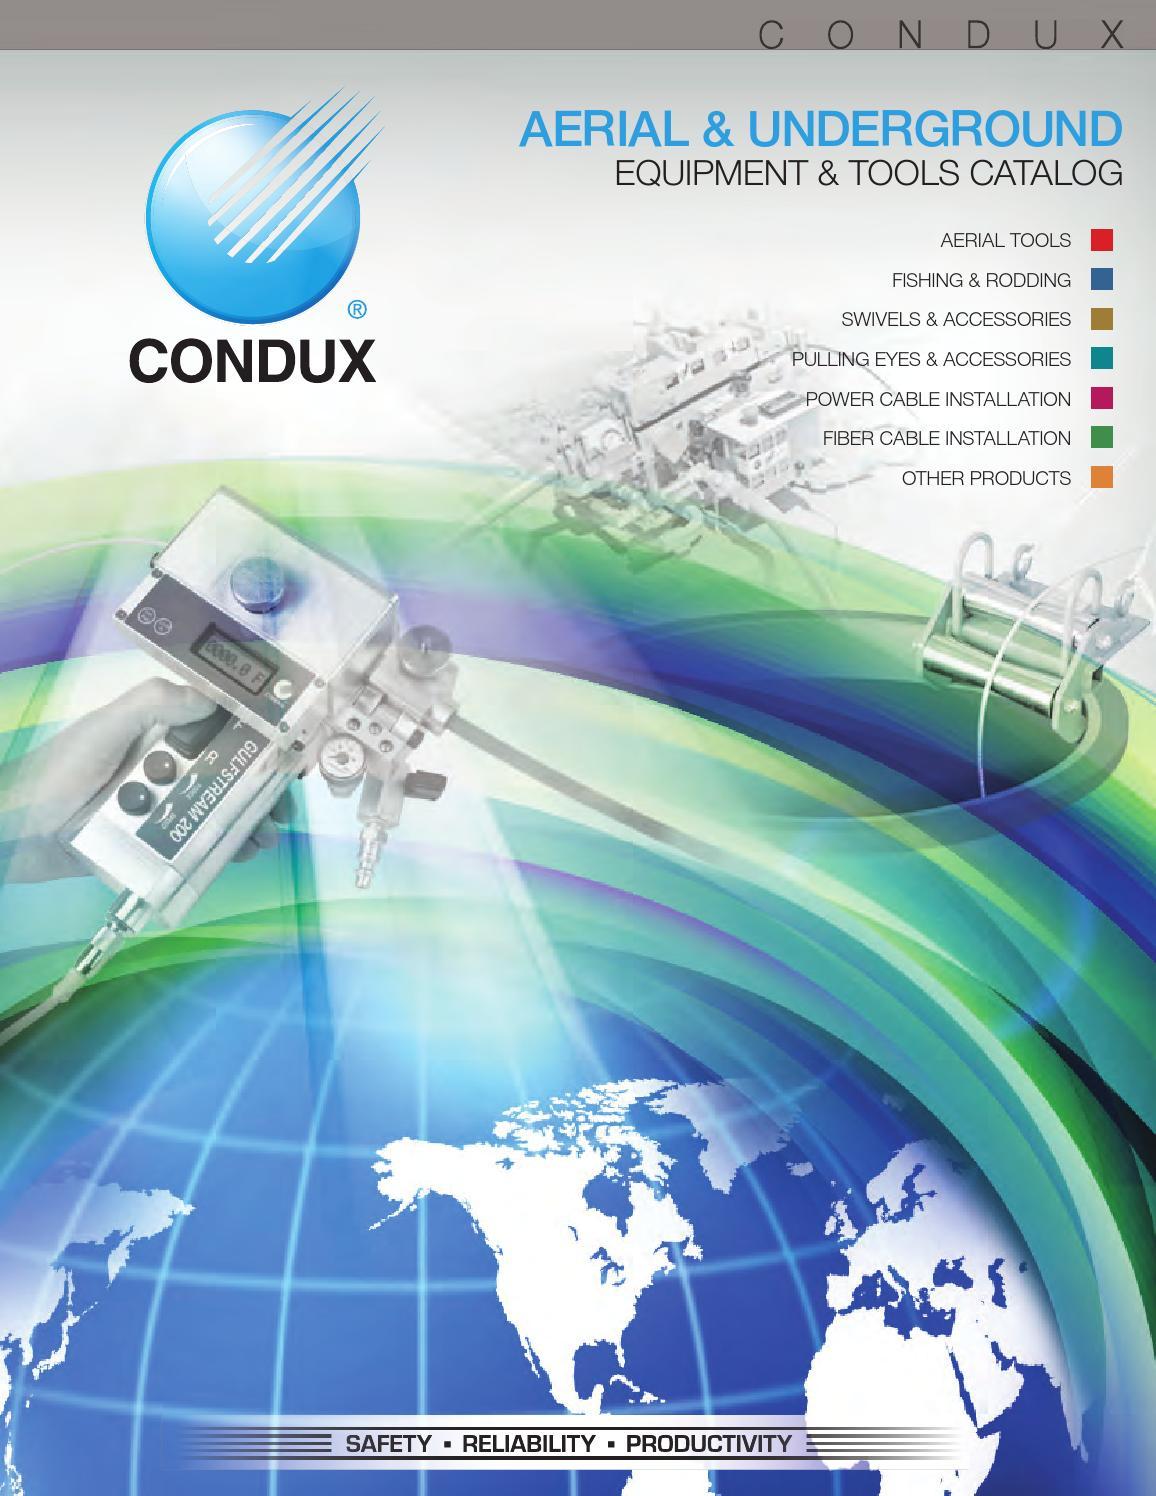 Condux 2013 & 2014 USA Catalog by Condux International - issuu